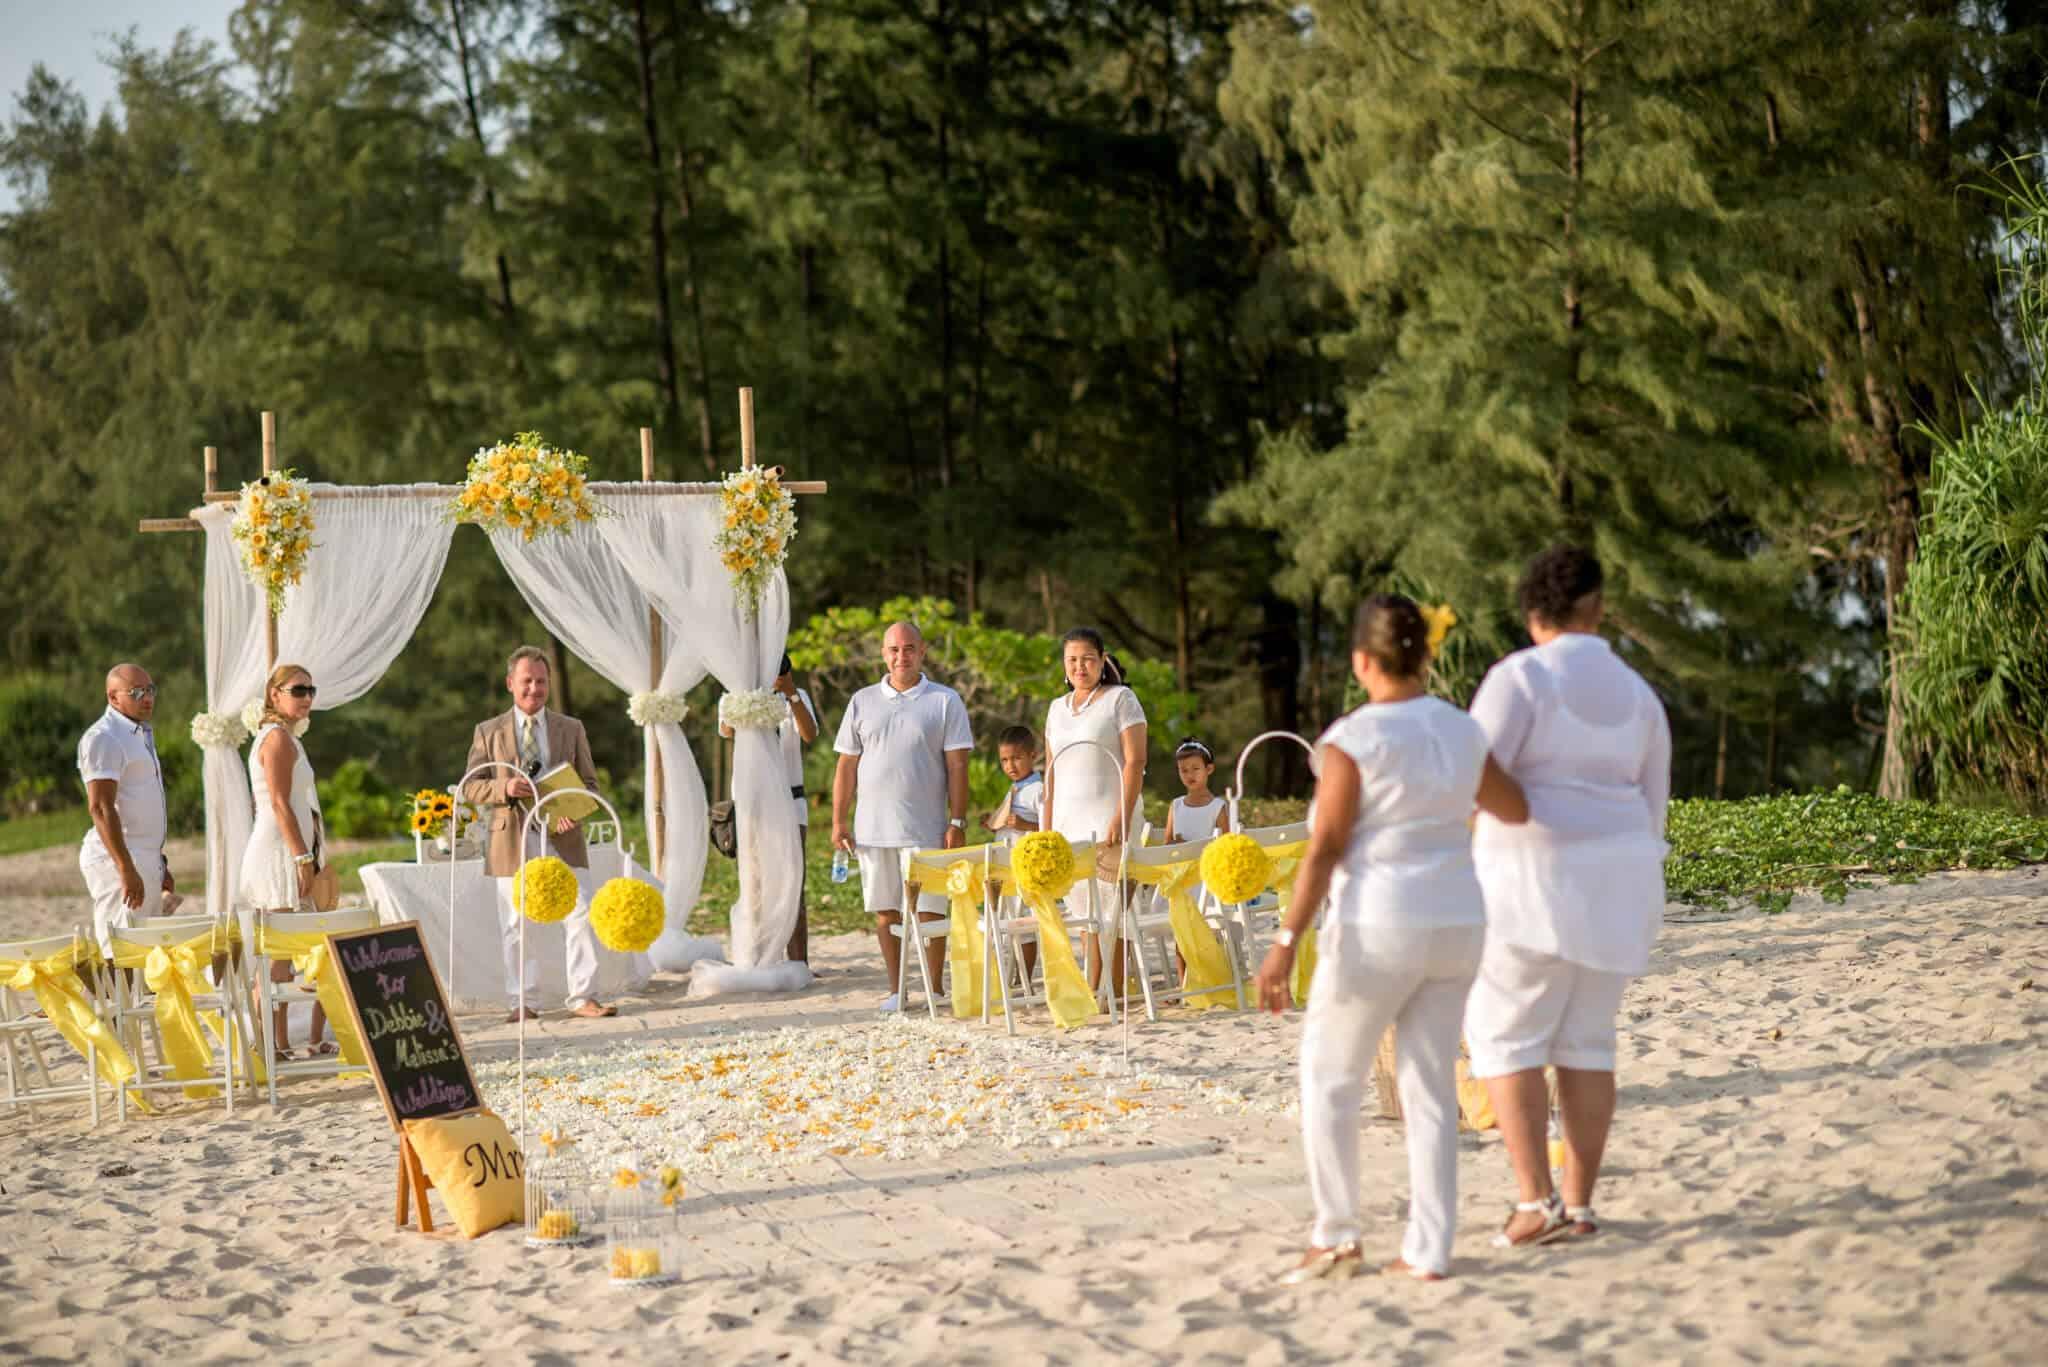 Phuket beach marriage celebrant (5)